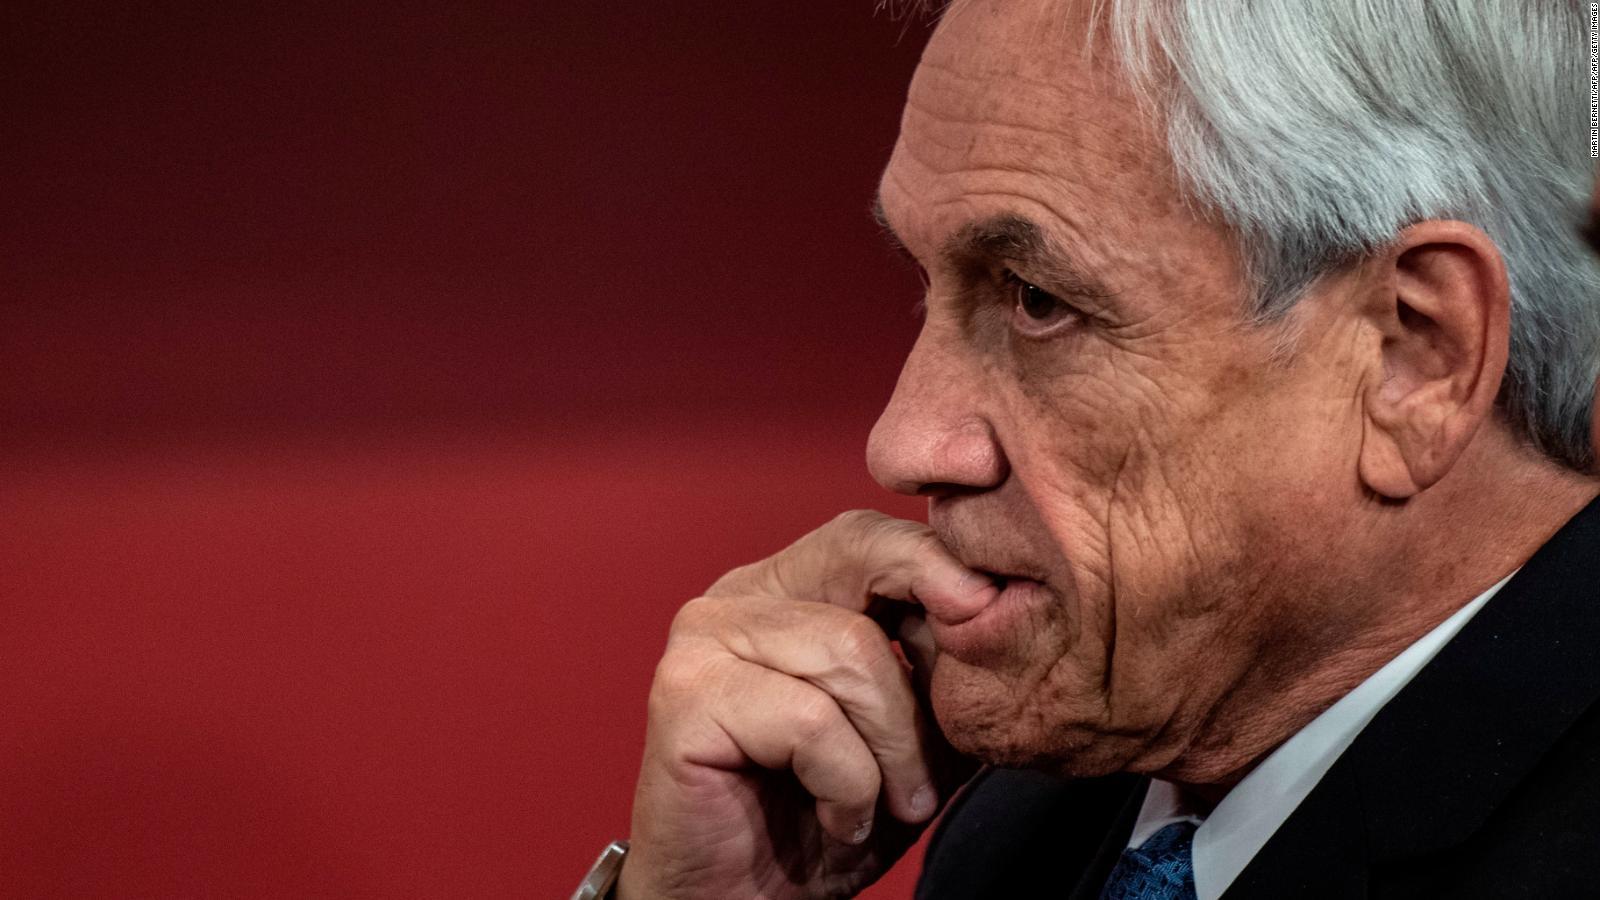 Acusación constitucional contra Piñera: Comisión revisora empezará a sesionar este martes en el Congreso